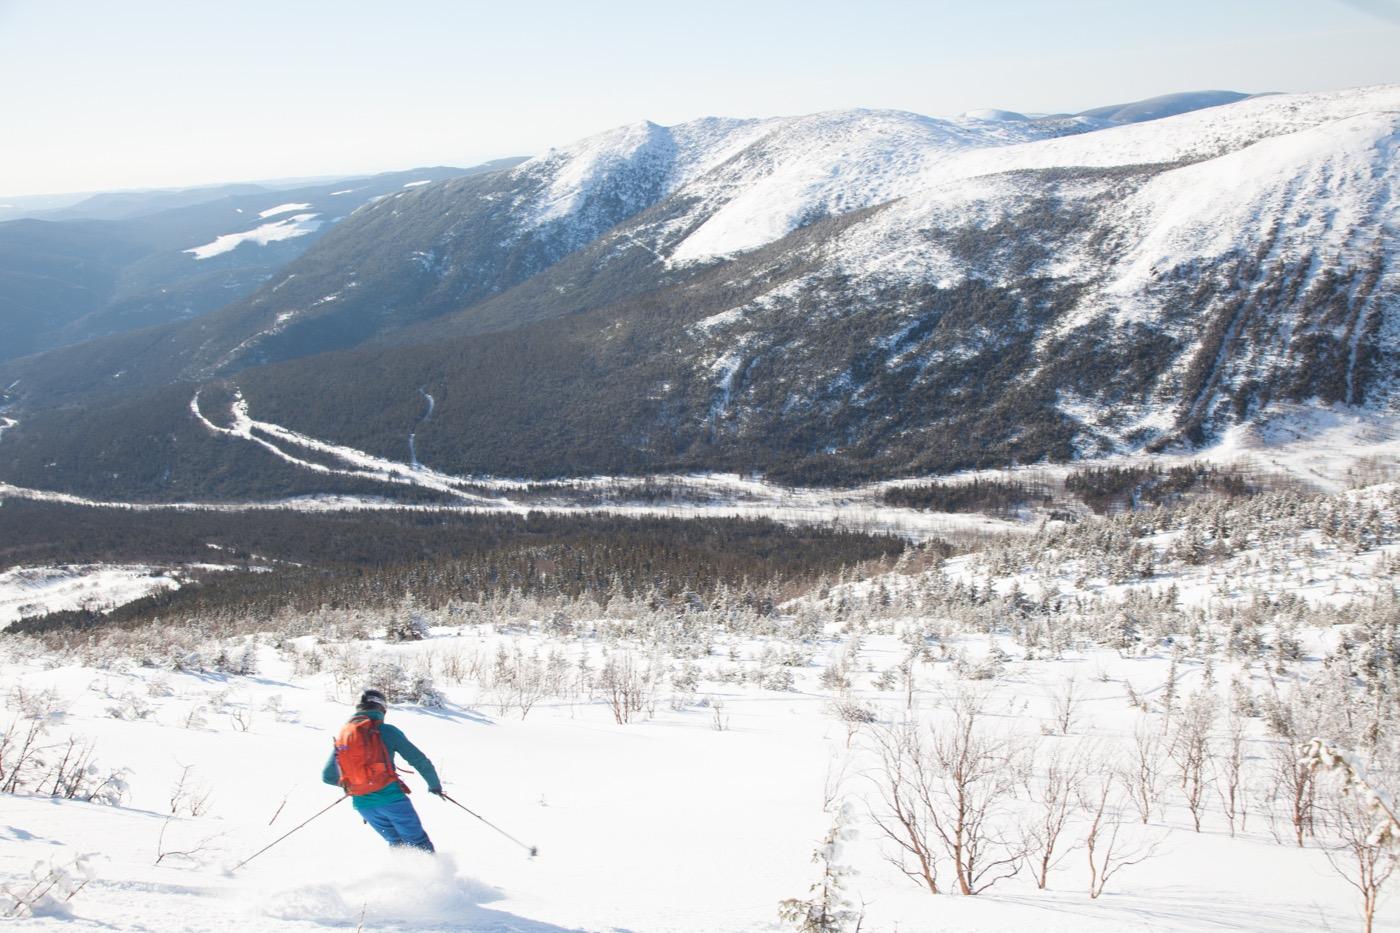 Chic Choc skier